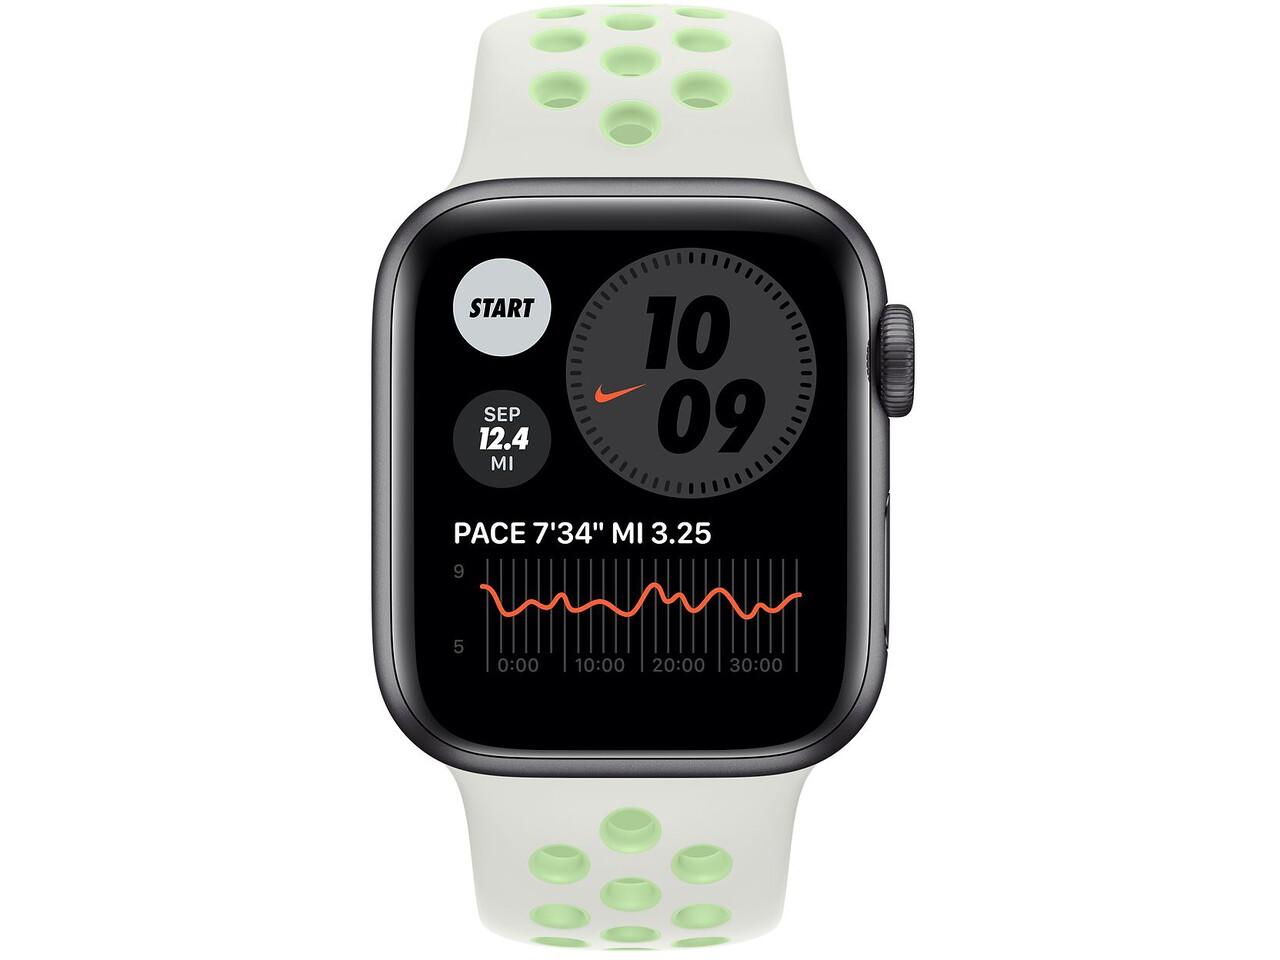 apple watch nike series 6 40mm space gray aluminum spruce auravapor green nike sport band